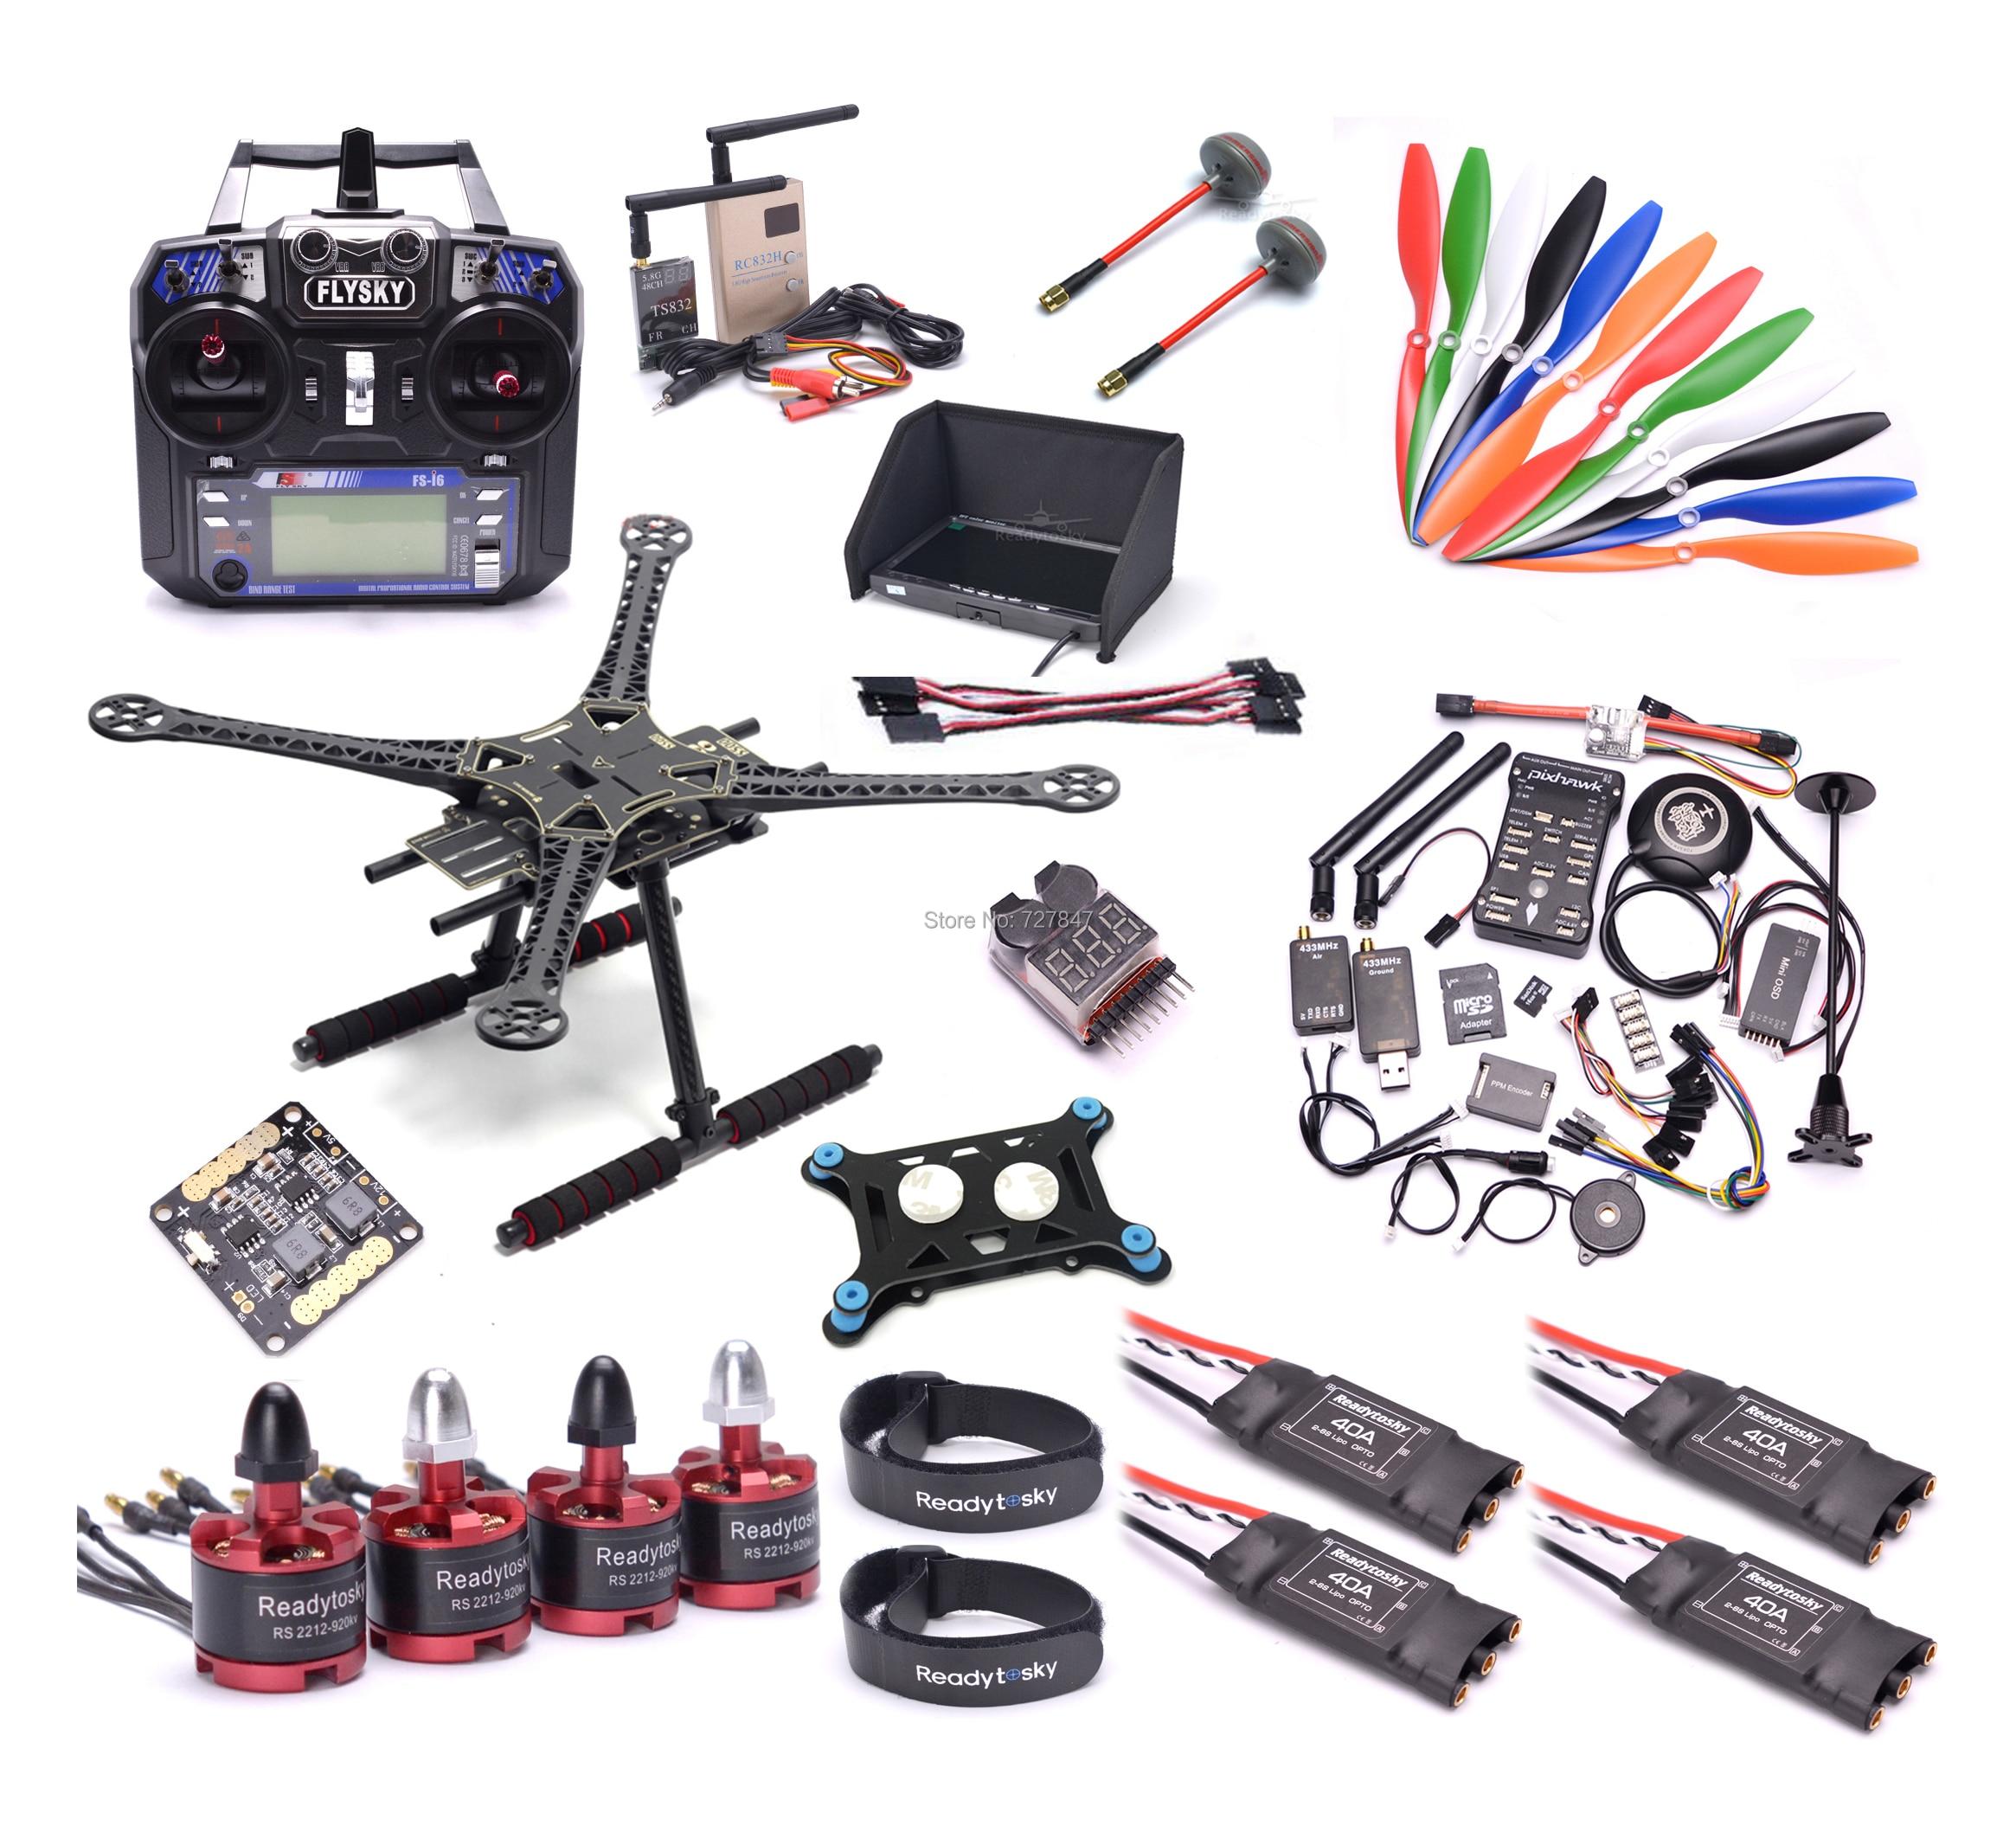 S500 500mm/F450 450 MILÍMETROS Quadcopter Kit PIXHAWK 2.4.8 2212 920KV 40A ESC Do Motor RC832 TS832 7 polegada monitor de Flysky I6 1045 Prop